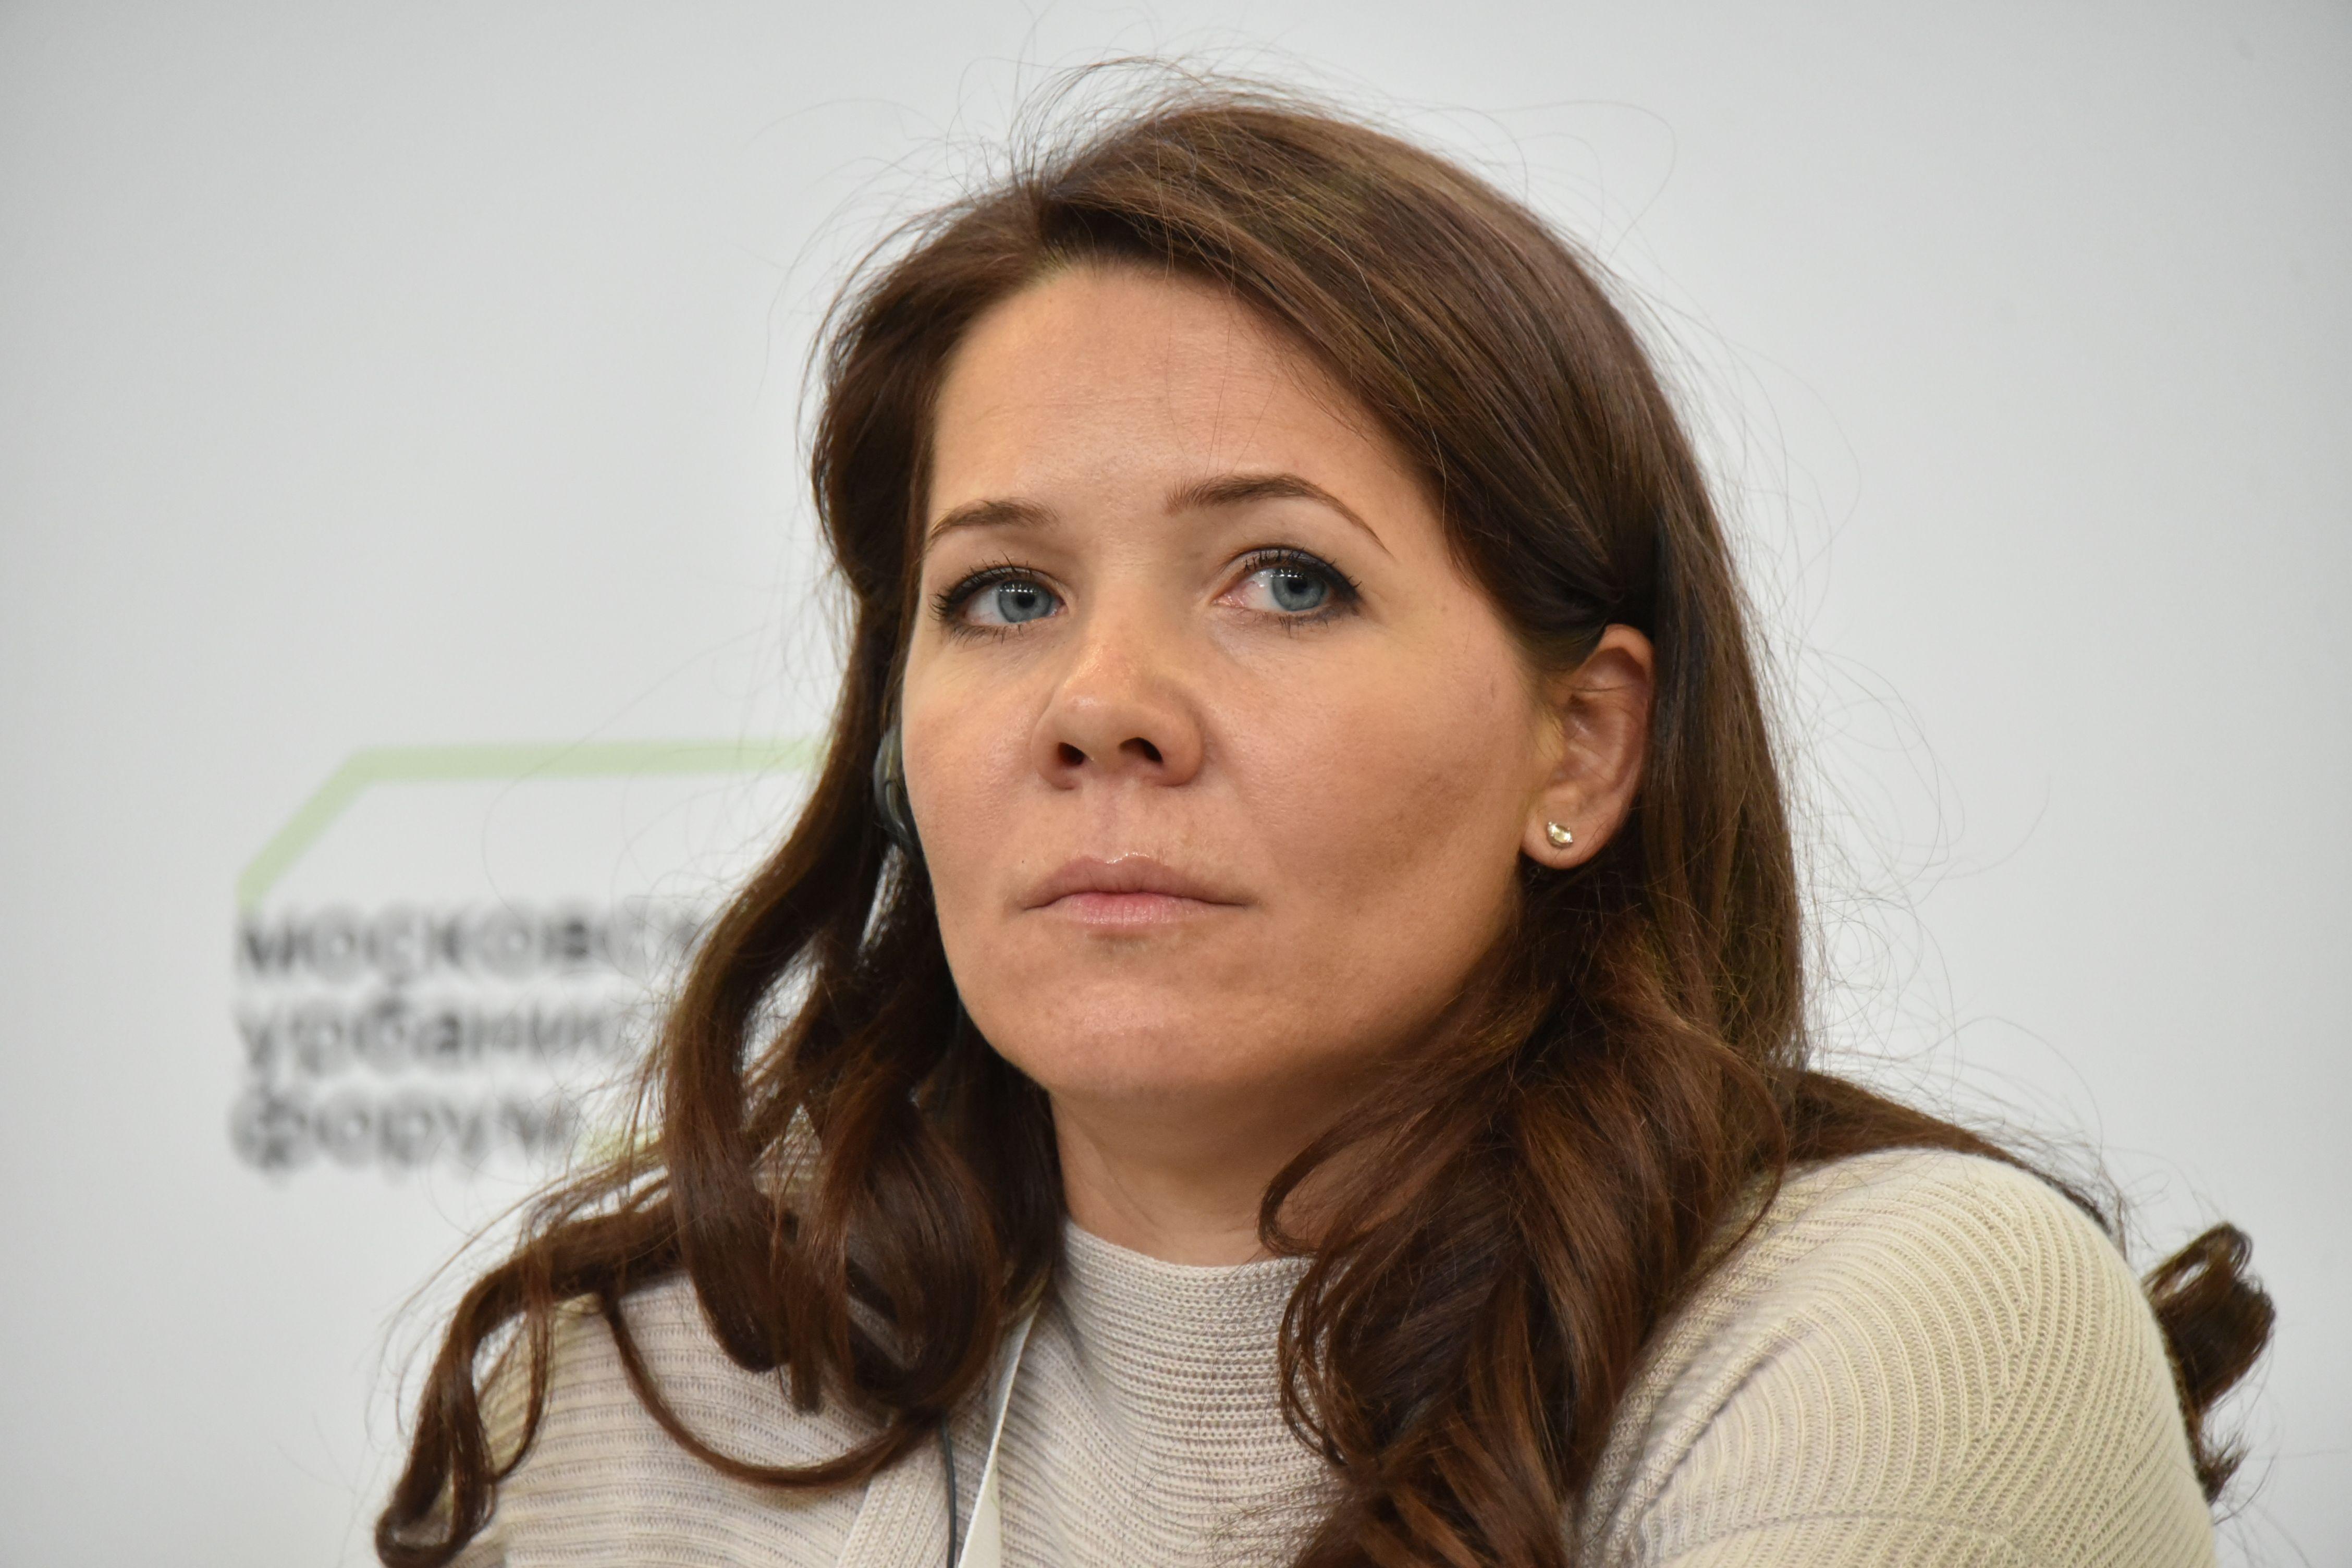 Анастасия Ракова вручила награды московским врачам за борьбу с COVID-19